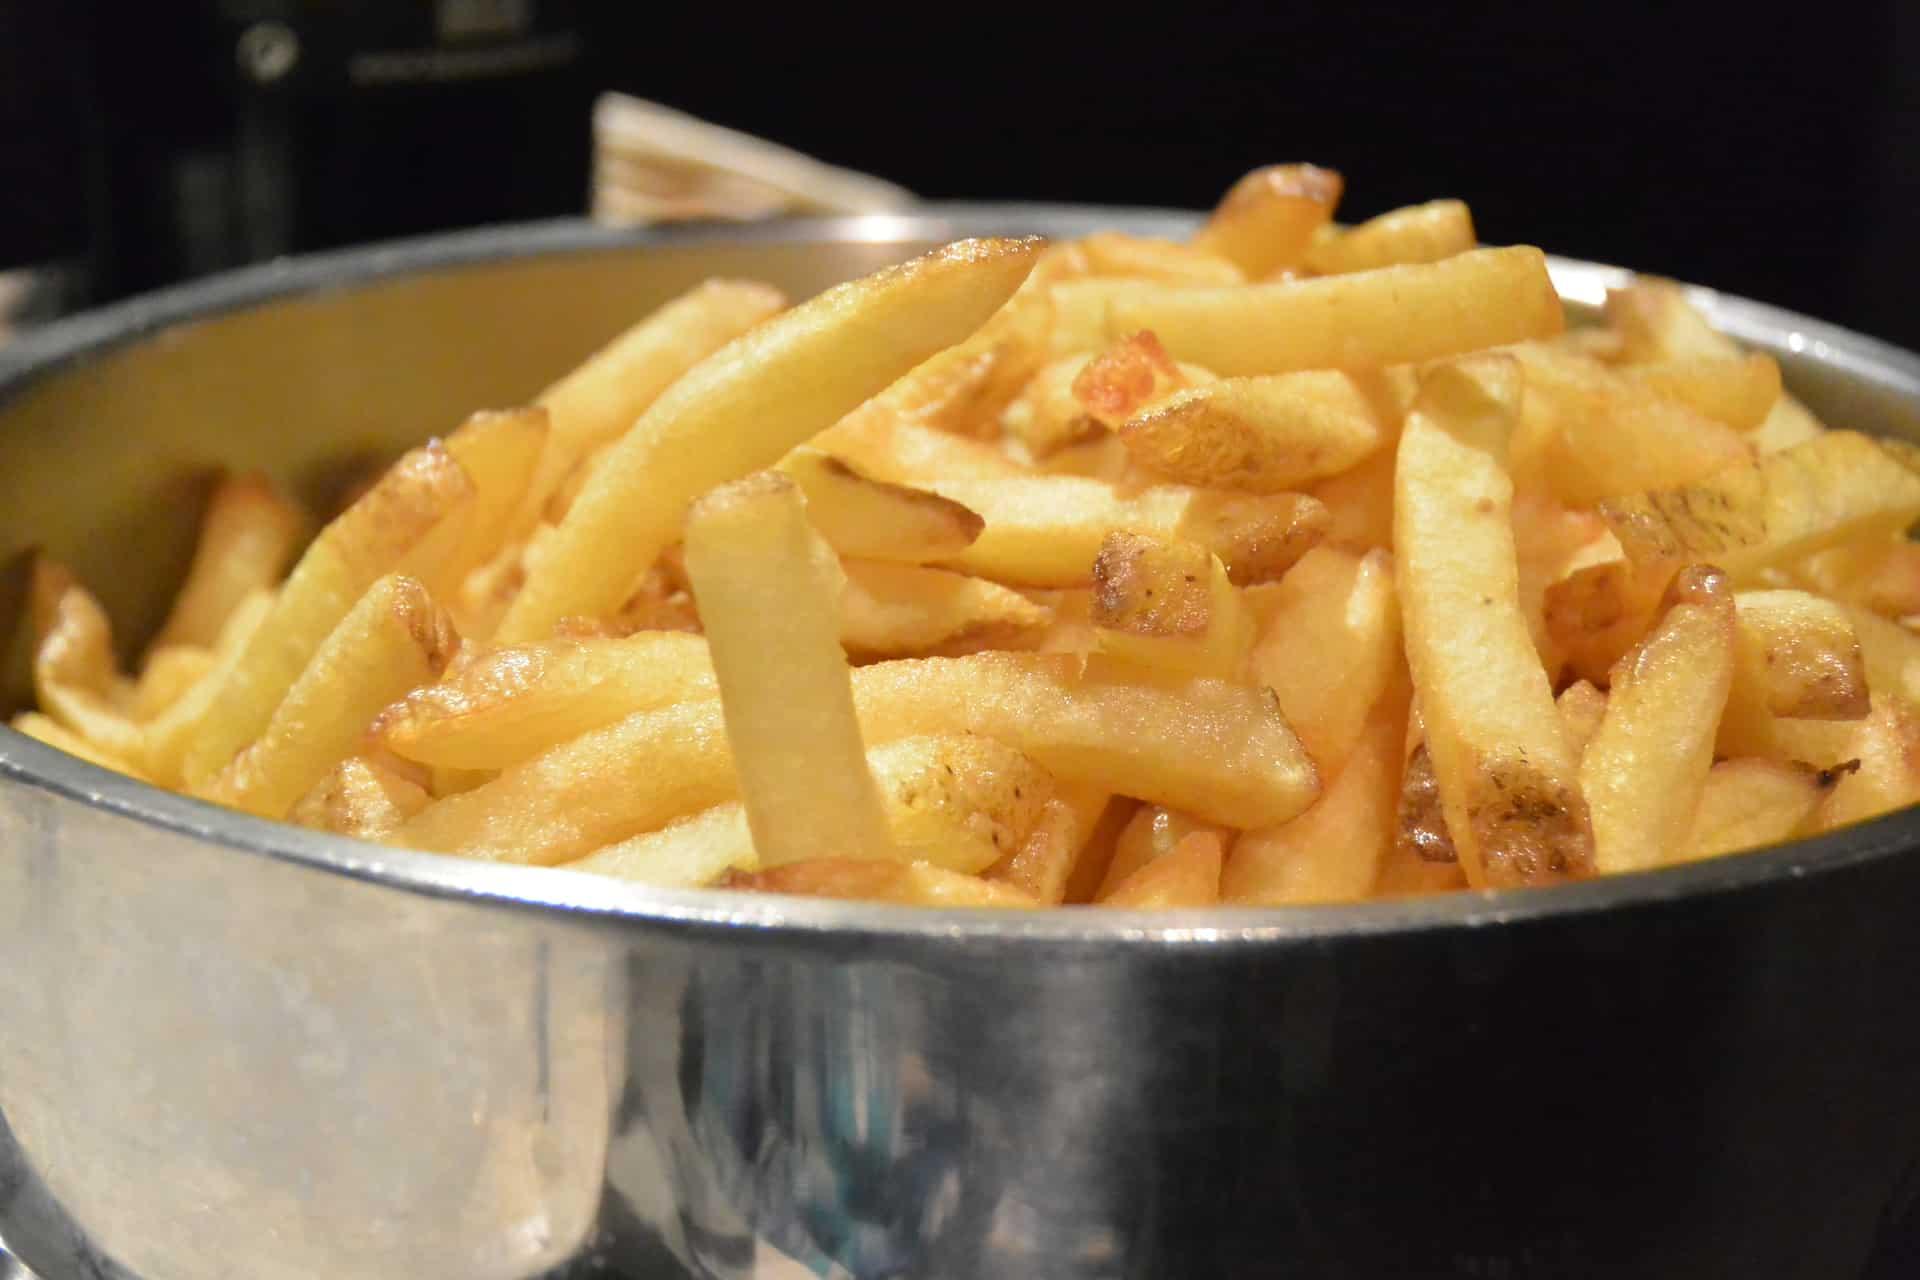 patatine-fritte-francese-parigi-ristorante